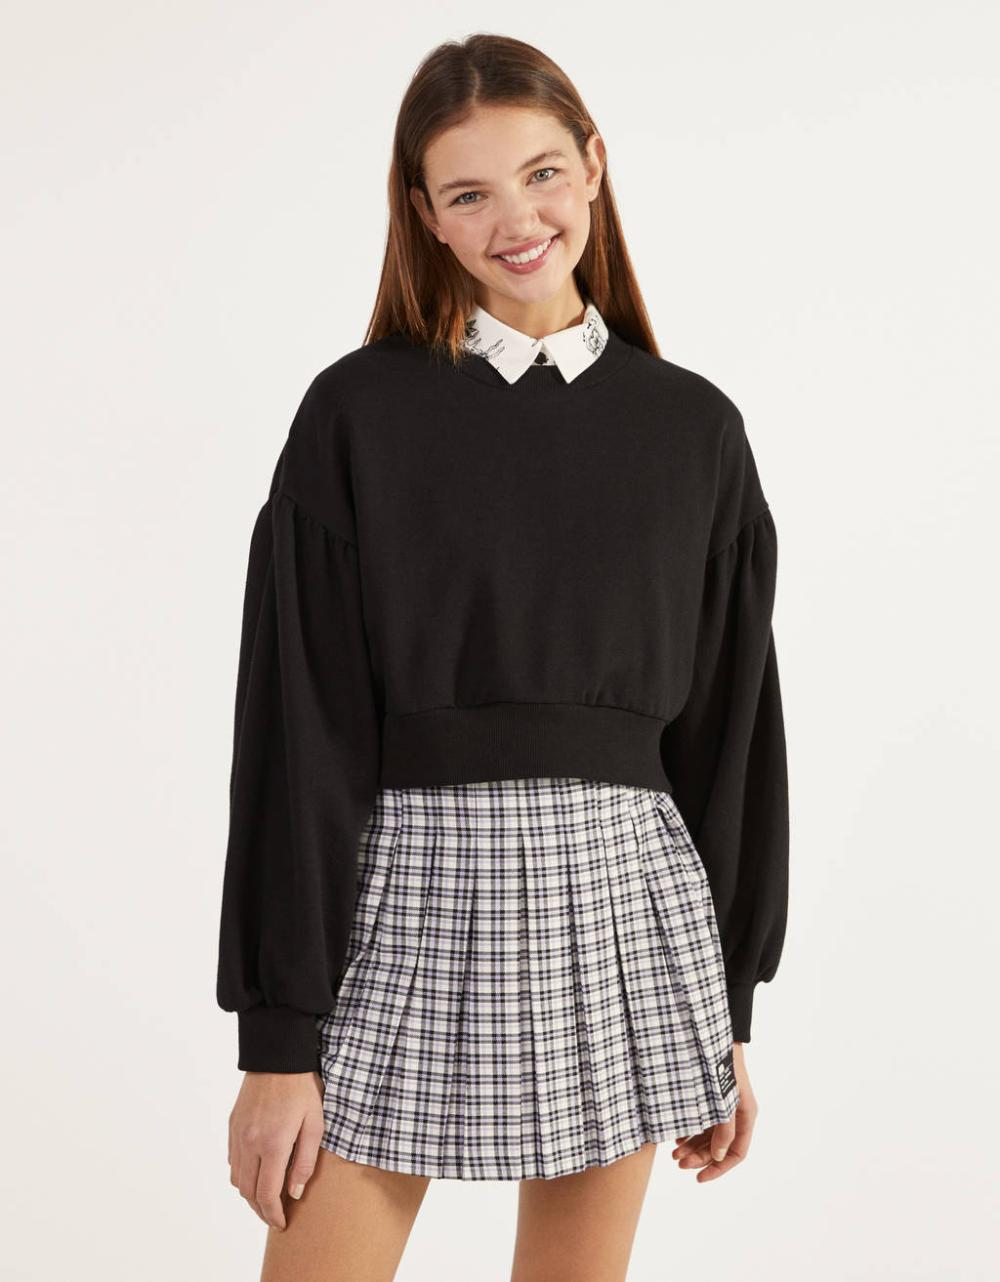 Pleated Mini Skirt Skirts Bershka United States In 2020 Pleated Mini Skirt Mini Skirts Pleated Mini Skirt Outfit